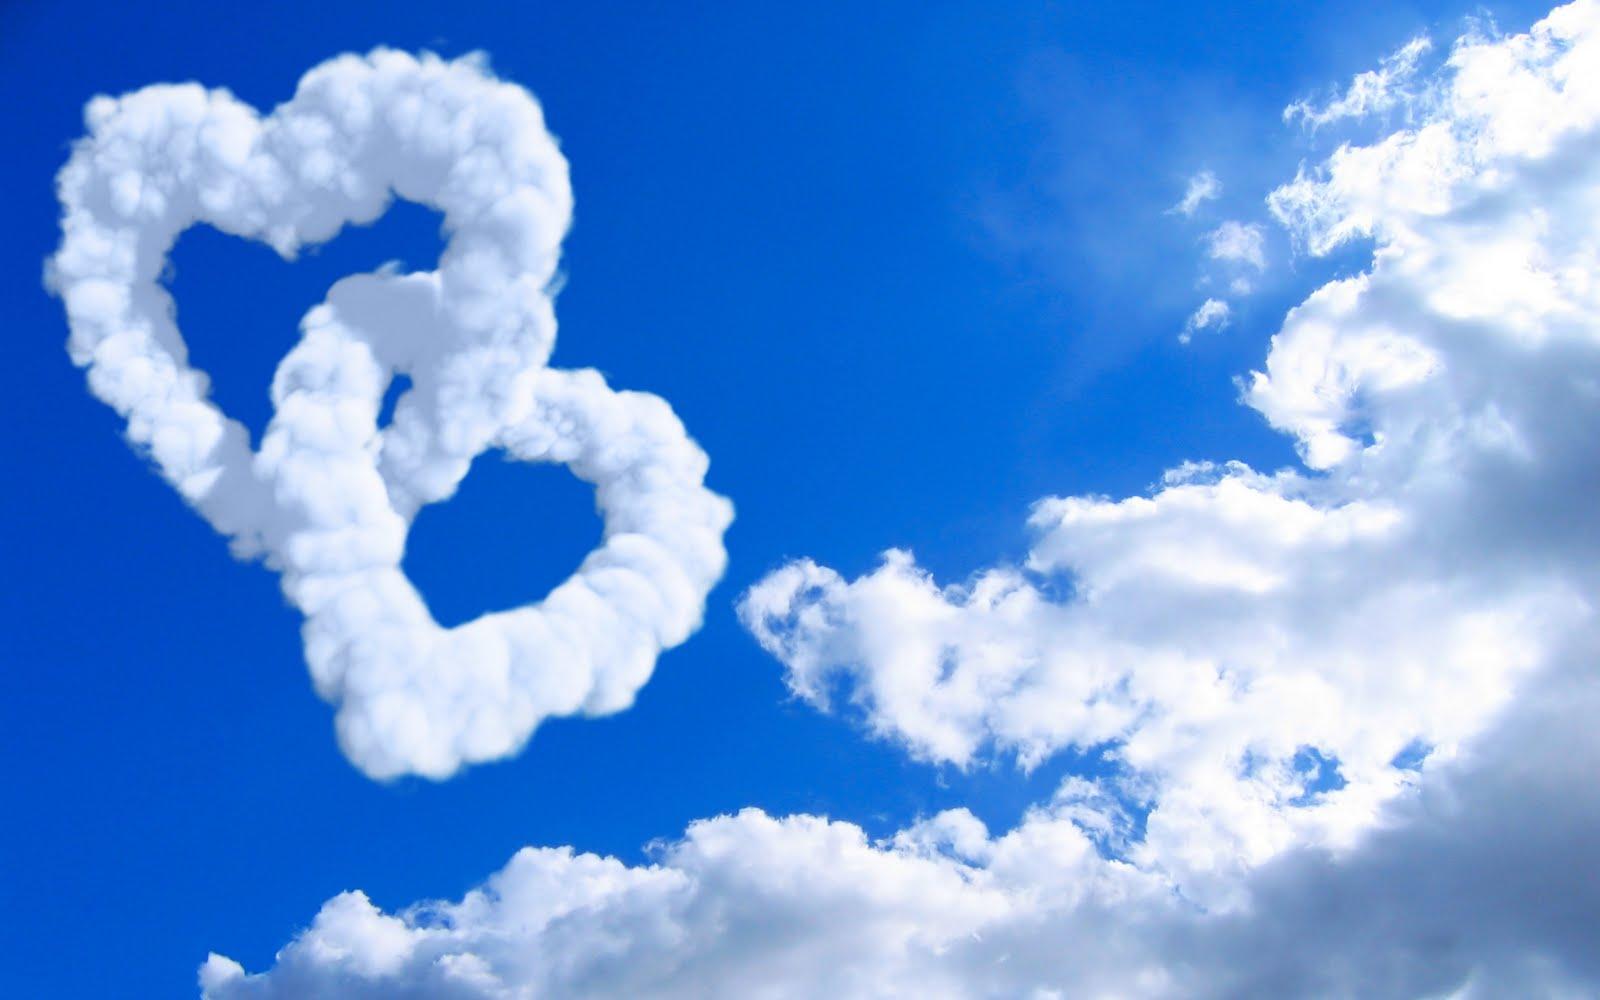 http://2.bp.blogspot.com/-boPFHHU1-FE/TcvYsGVzBmI/AAAAAAAAAZc/cOp7lV9mlbo/s1600/hearts_in_clouds-wide.jpg